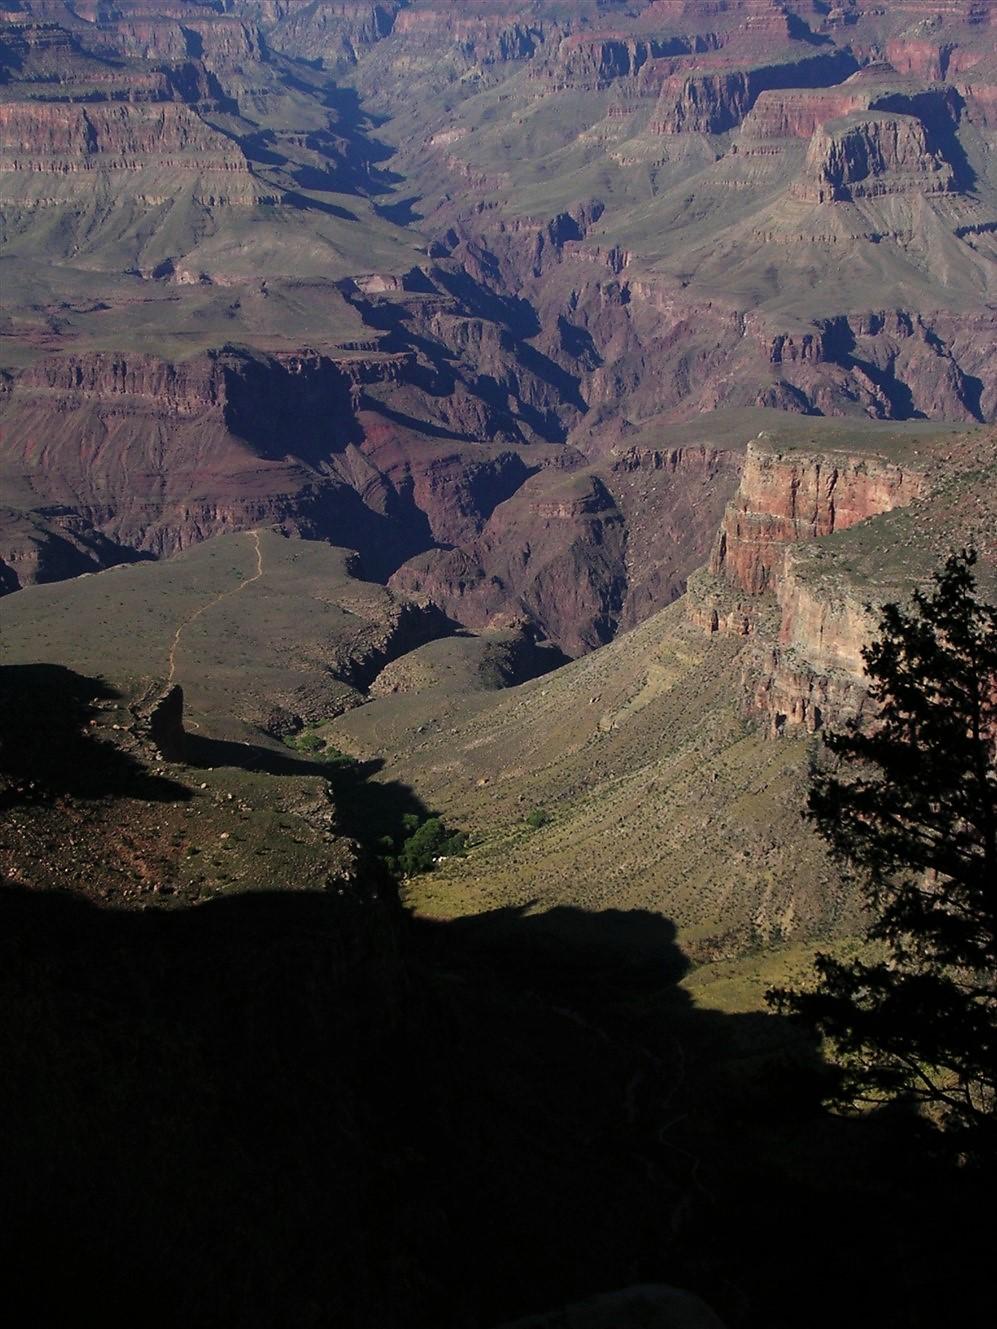 2005 06 26 Grand Canyon 44.jpg